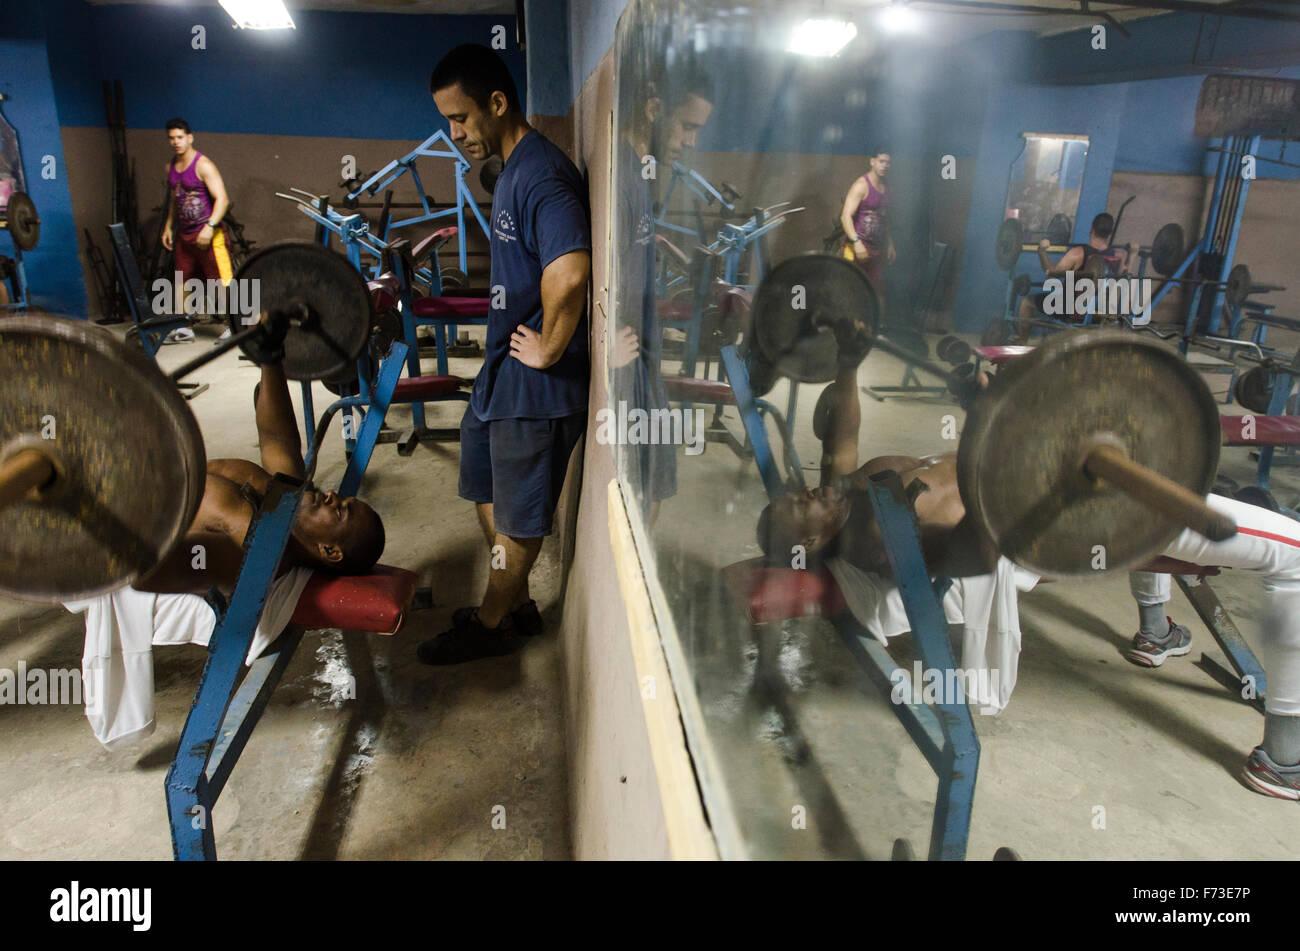 Männer trainieren Sie im Fitnessraum in Havanna, Kuba. Stockbild